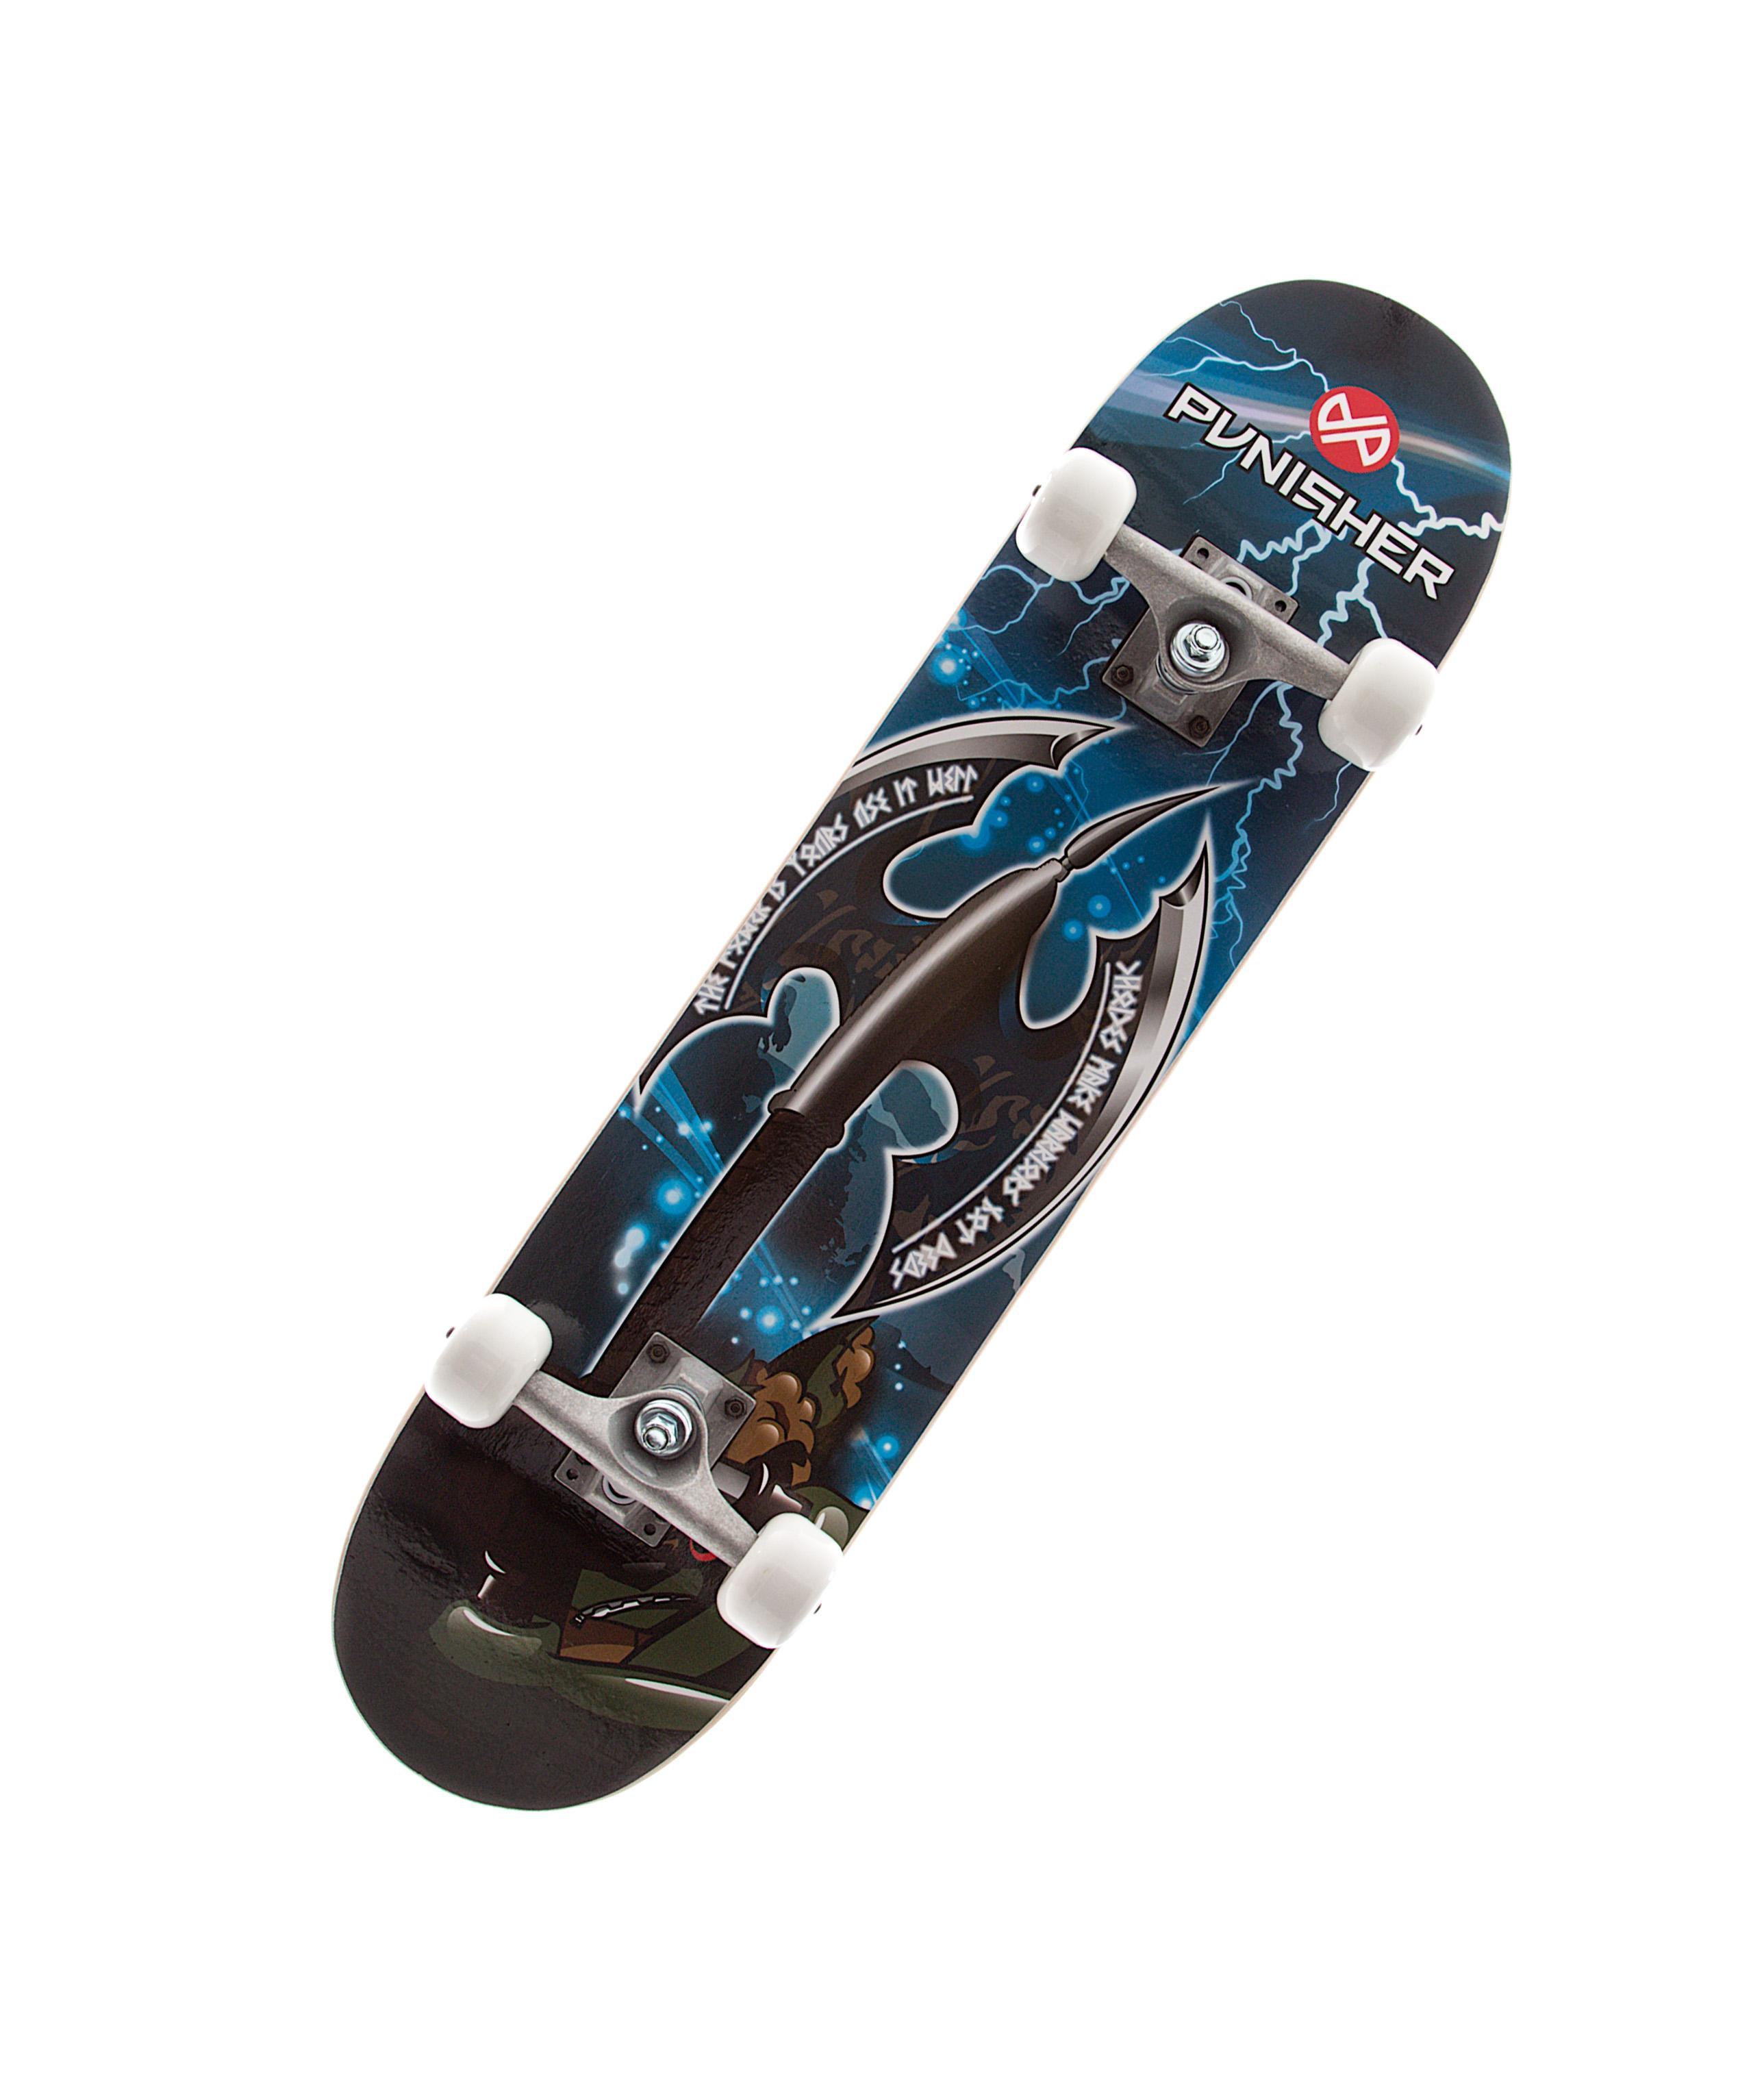 Amazon.com : Punisher Skateboards Warrior Complete